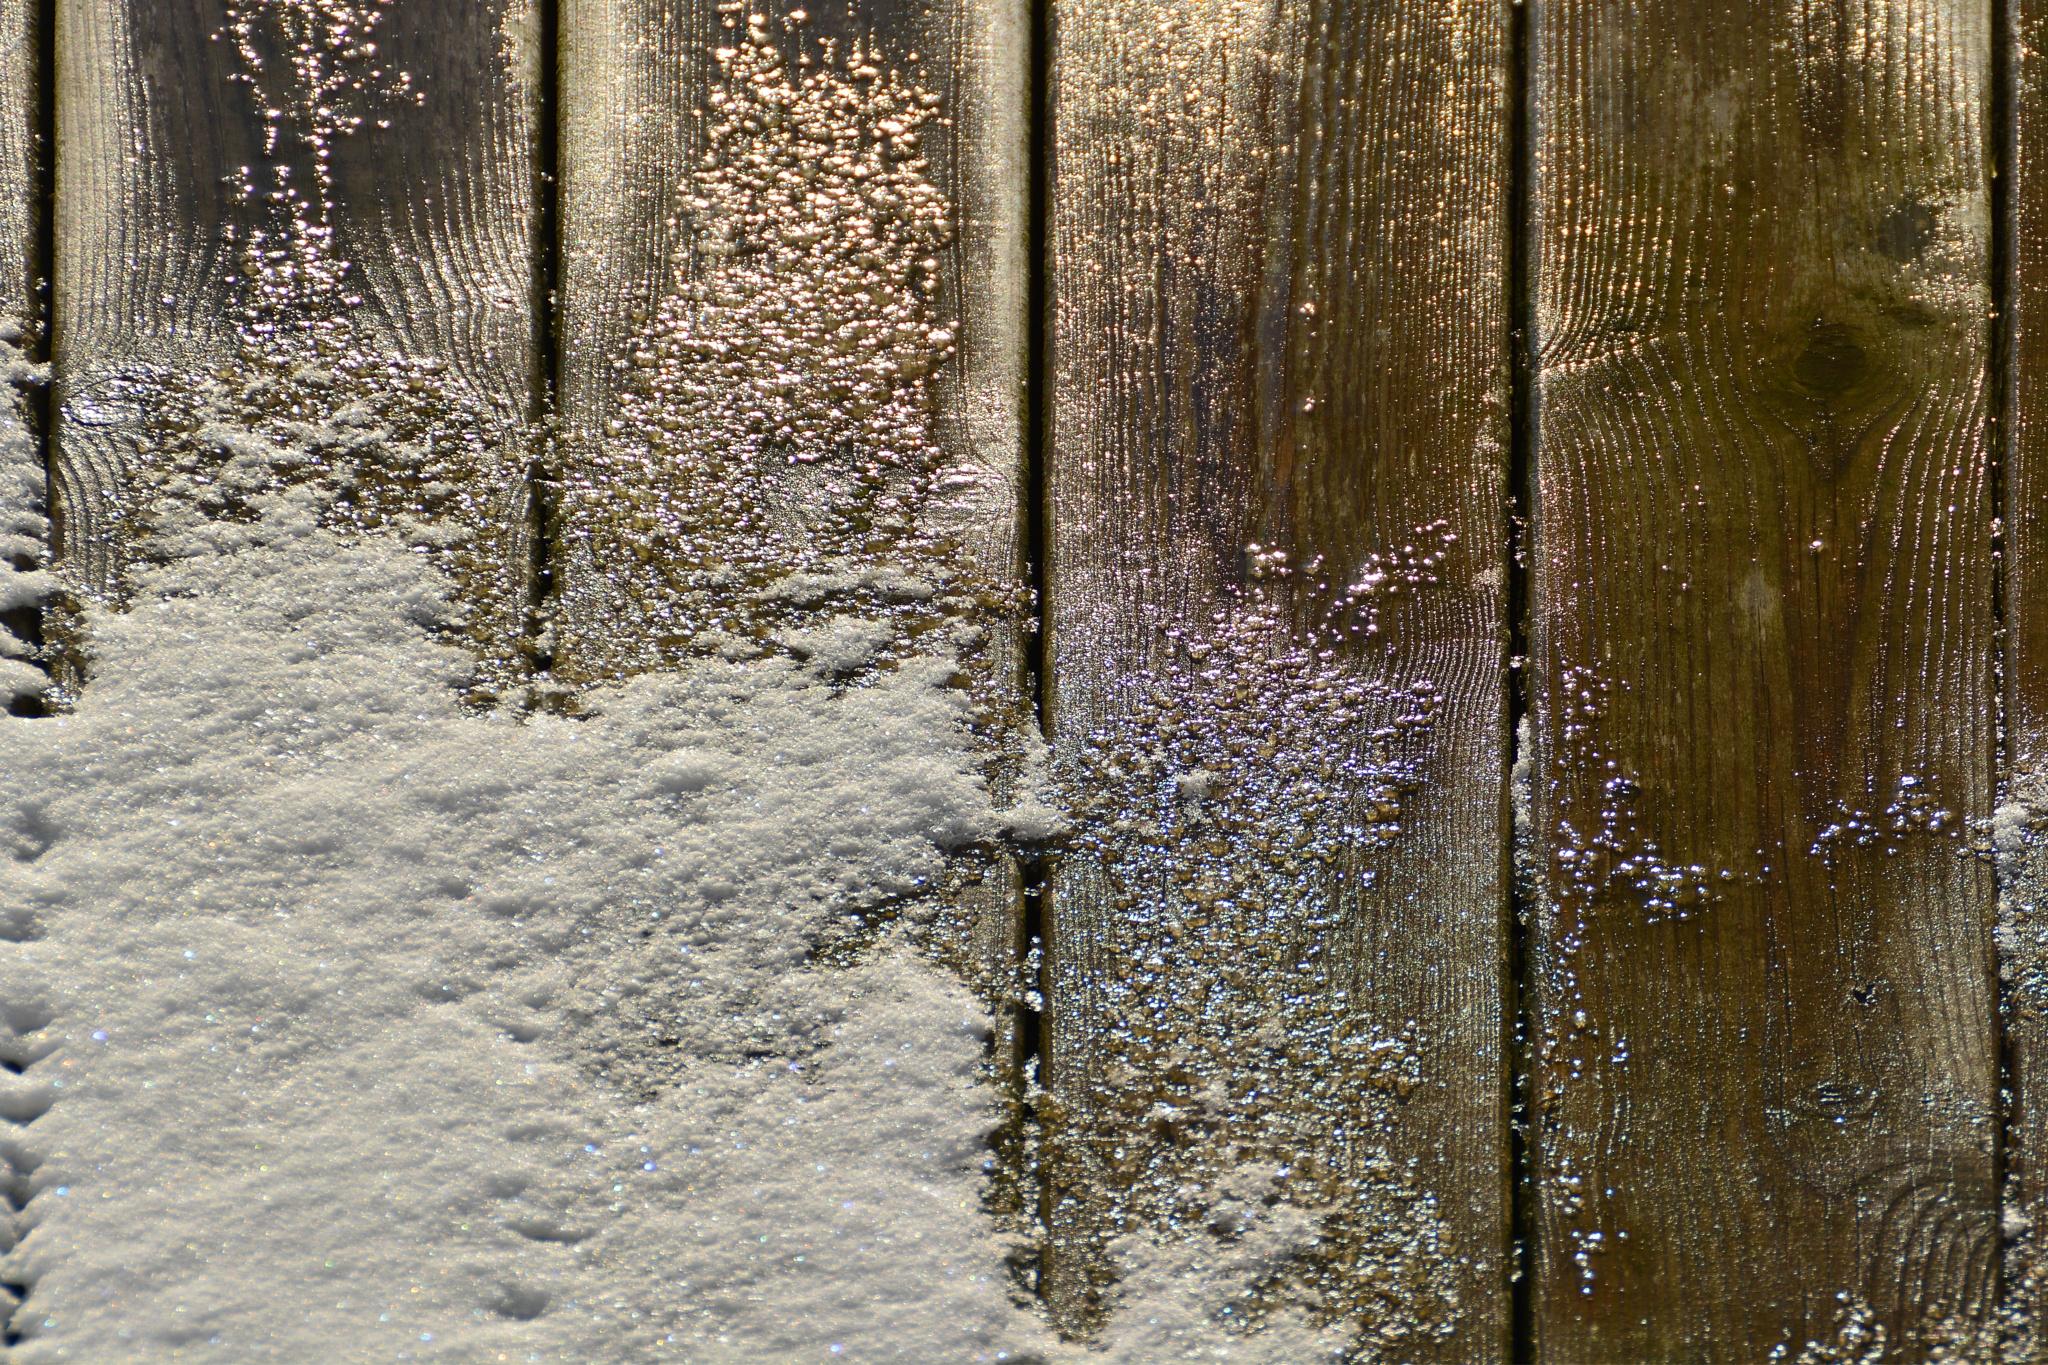 Snow on wood by MSchirmann